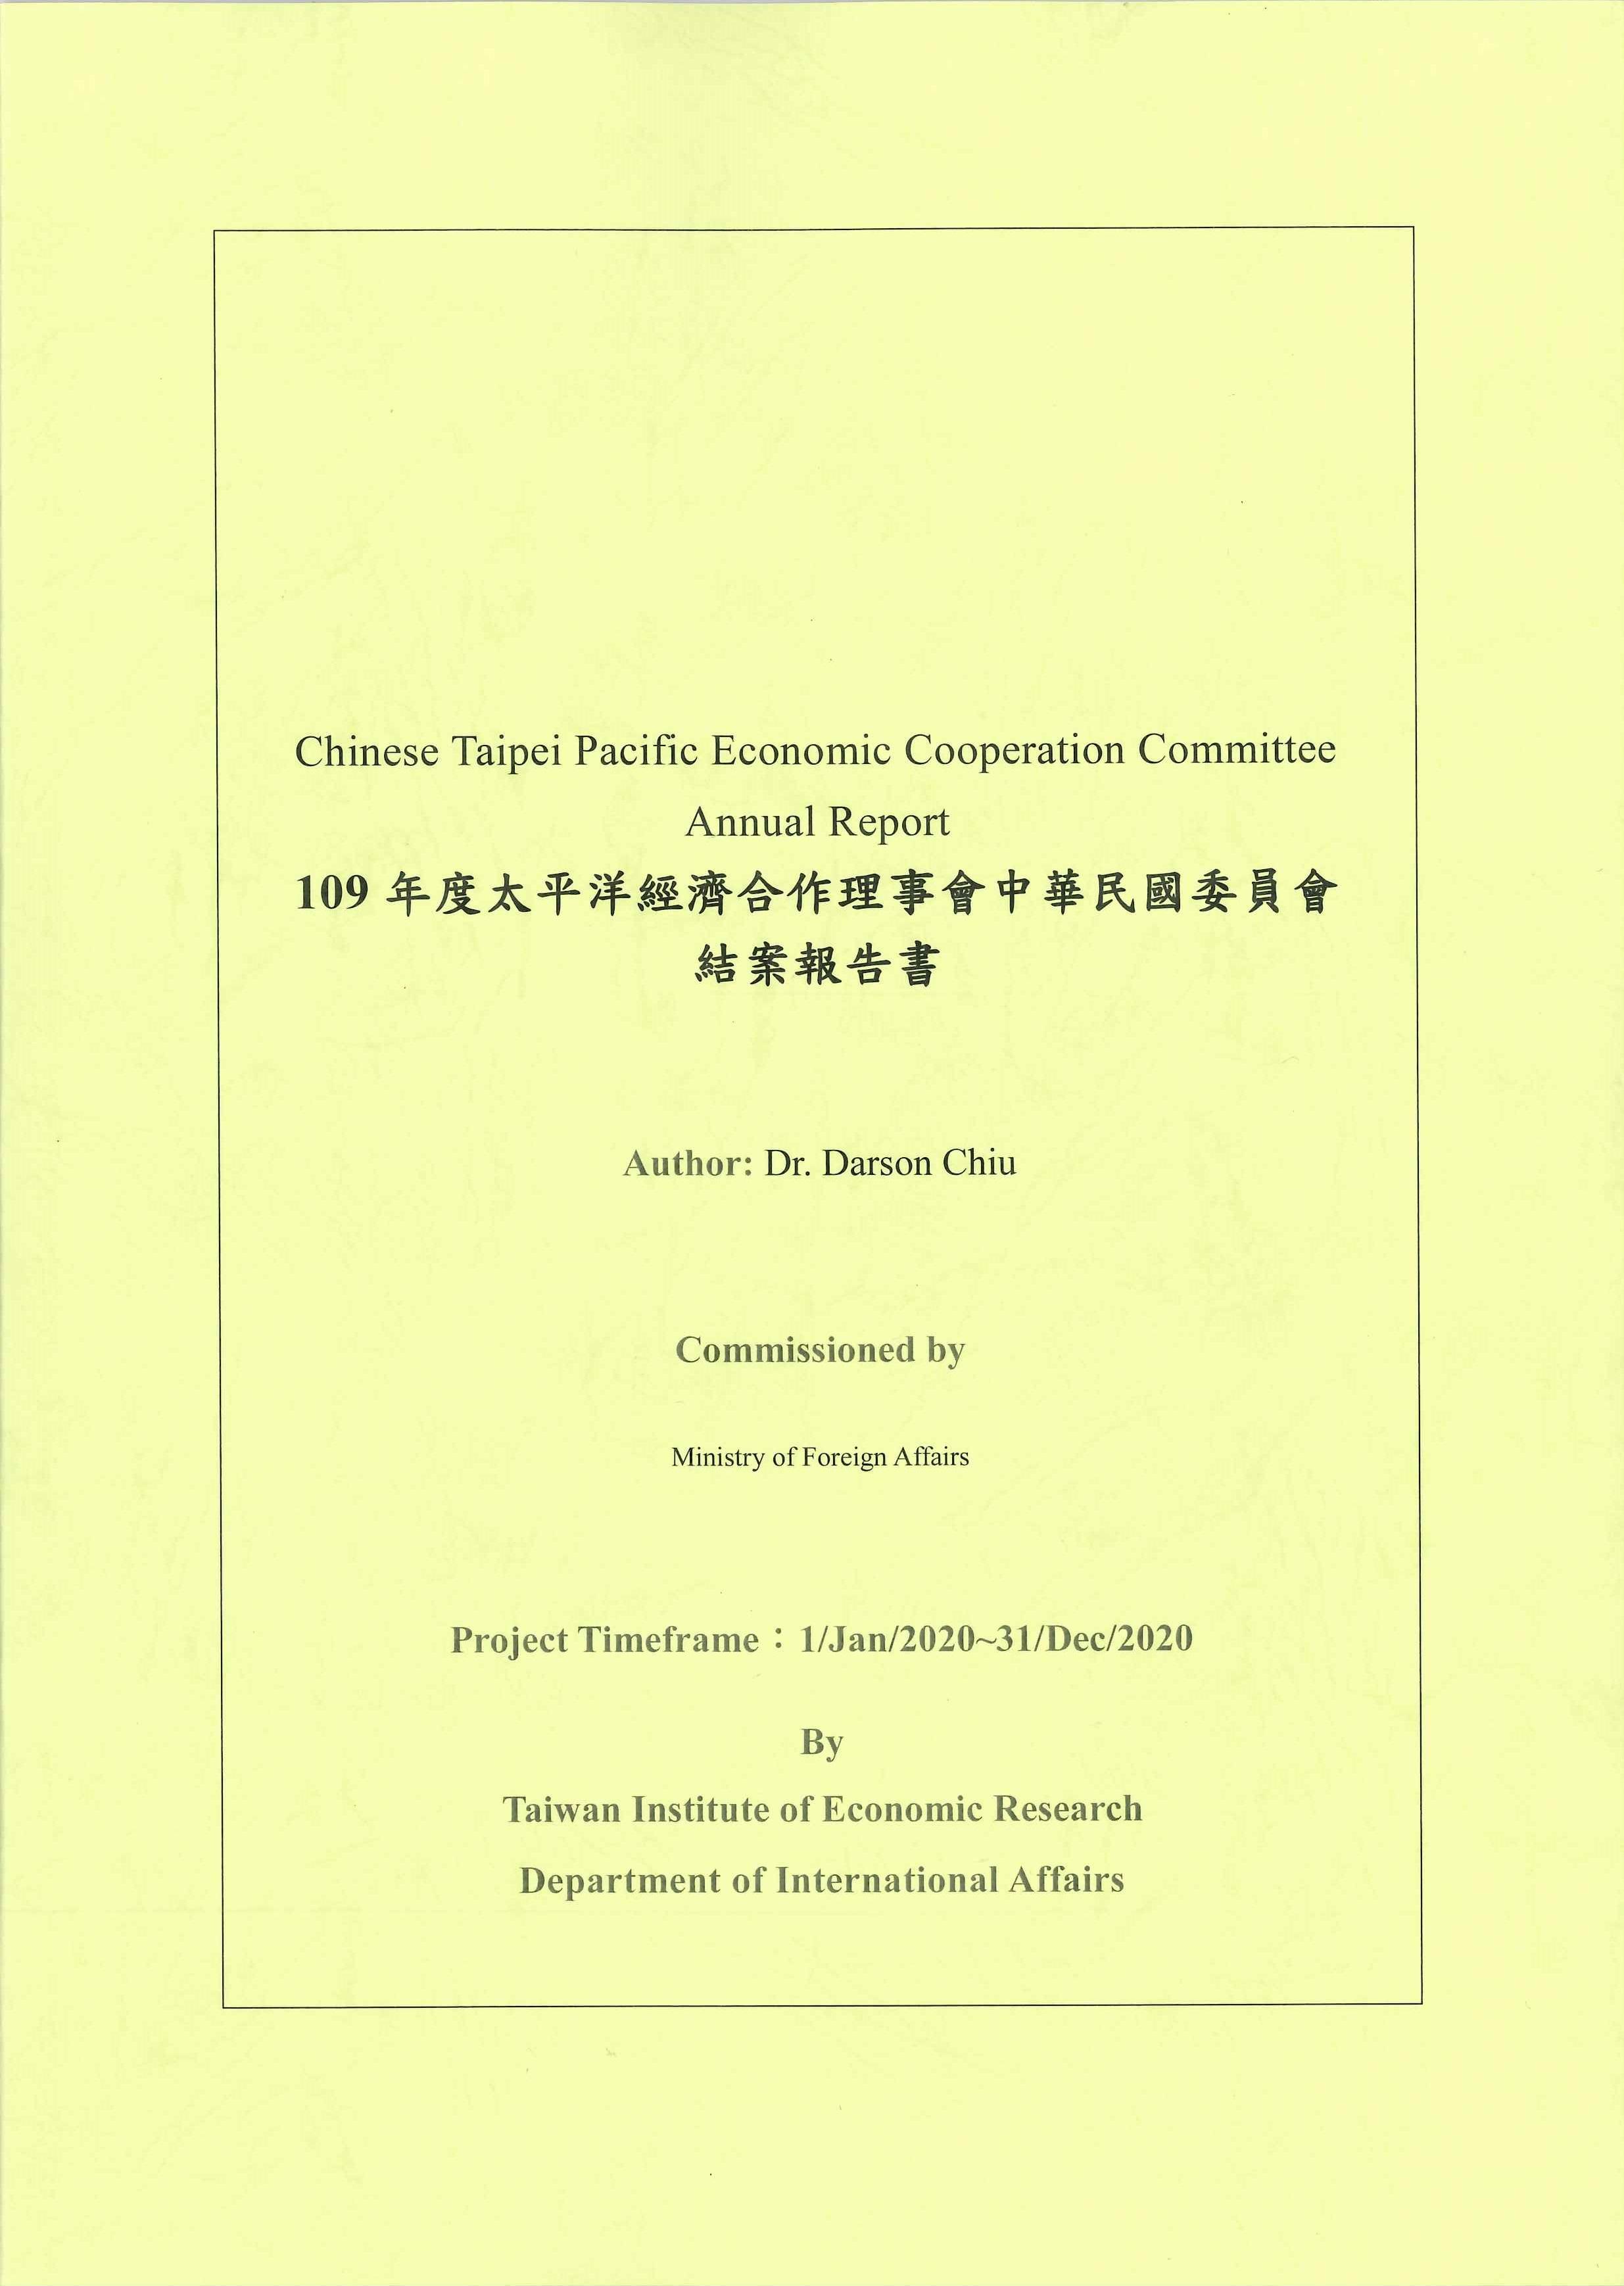 ...年度太平洋經濟合作理事會中華民國委員會:結案報告書=Chinese Taipei Pacific Economic Cooperation Committee annual report